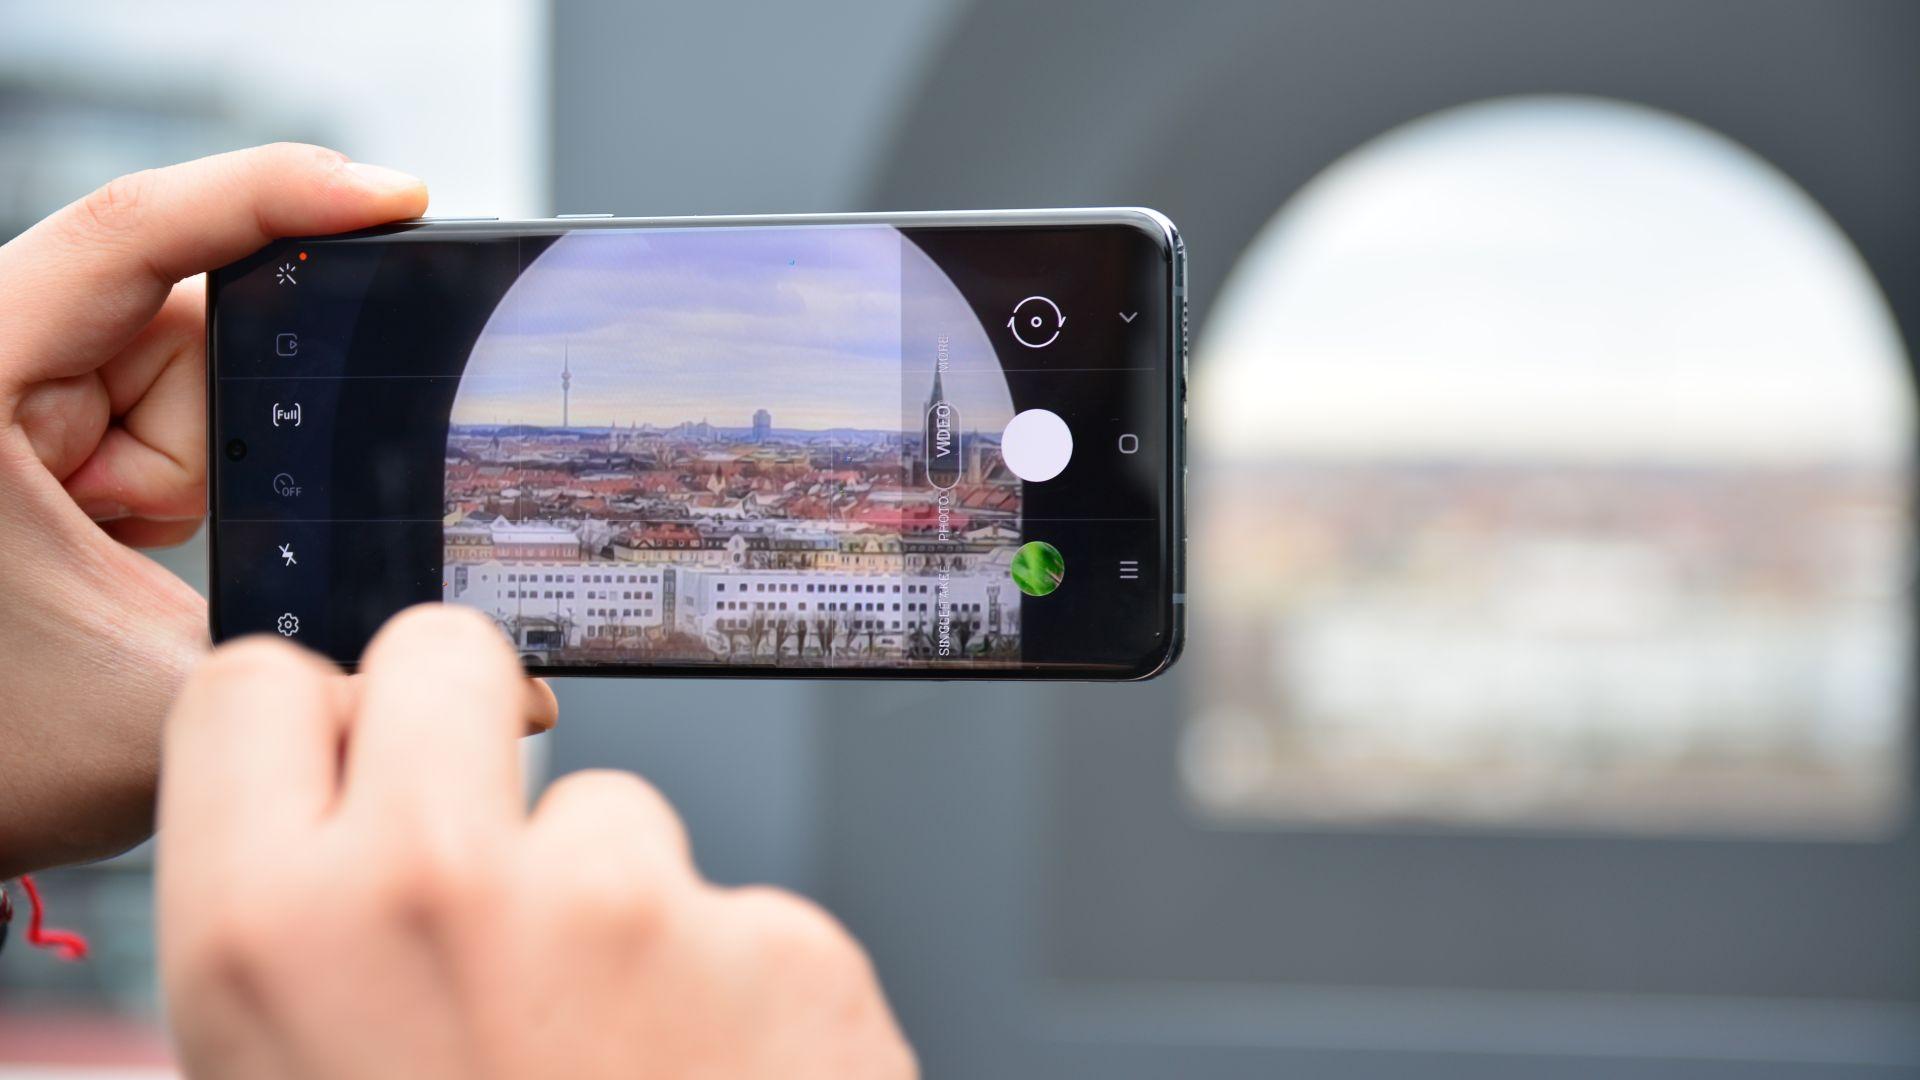 Samsung Galaxy S20 Ultra има 10 пъти оптичен зуум